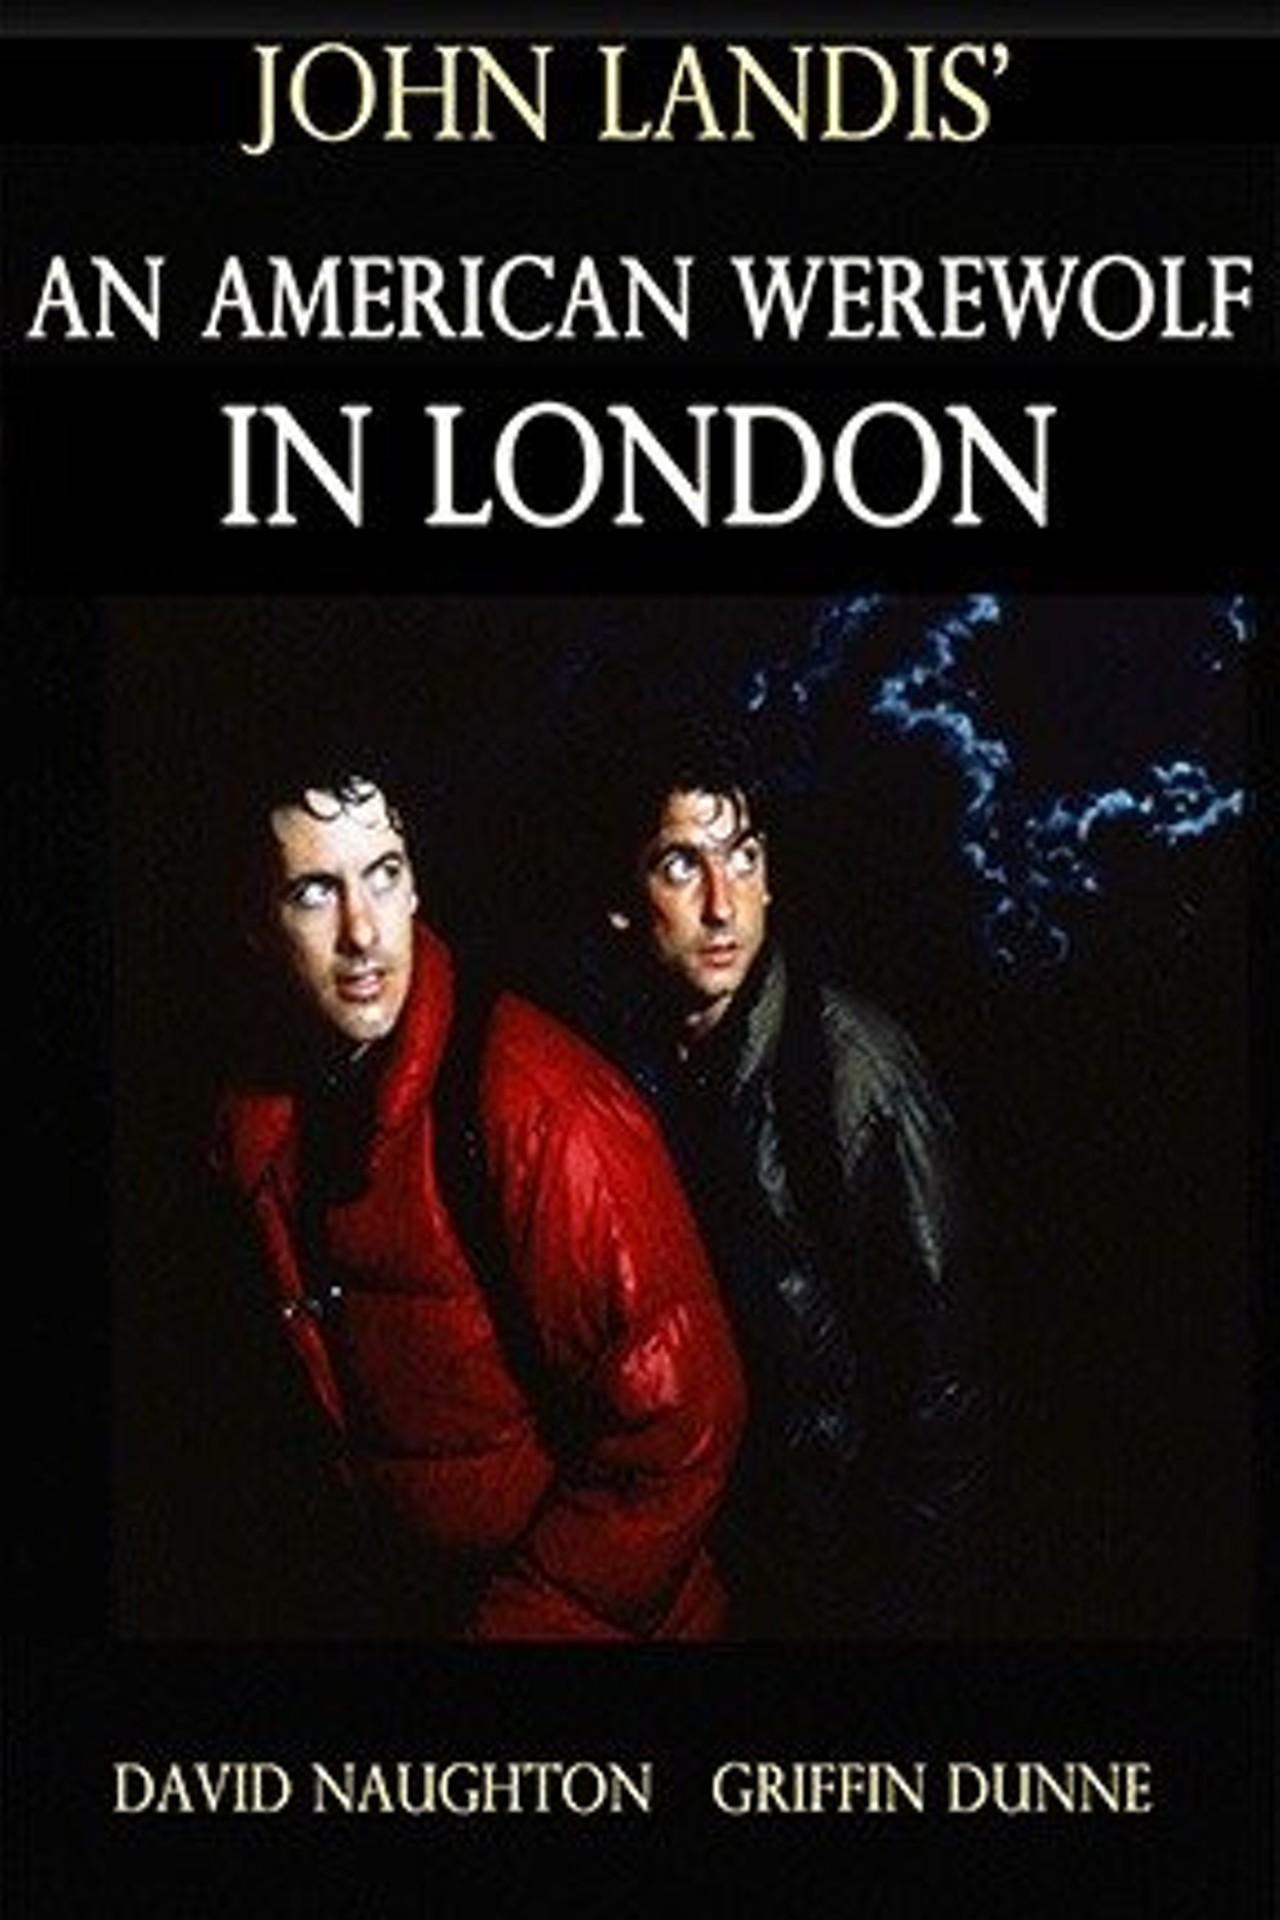 An Erotic Werewolf In London an american werewolf in london | east bay express